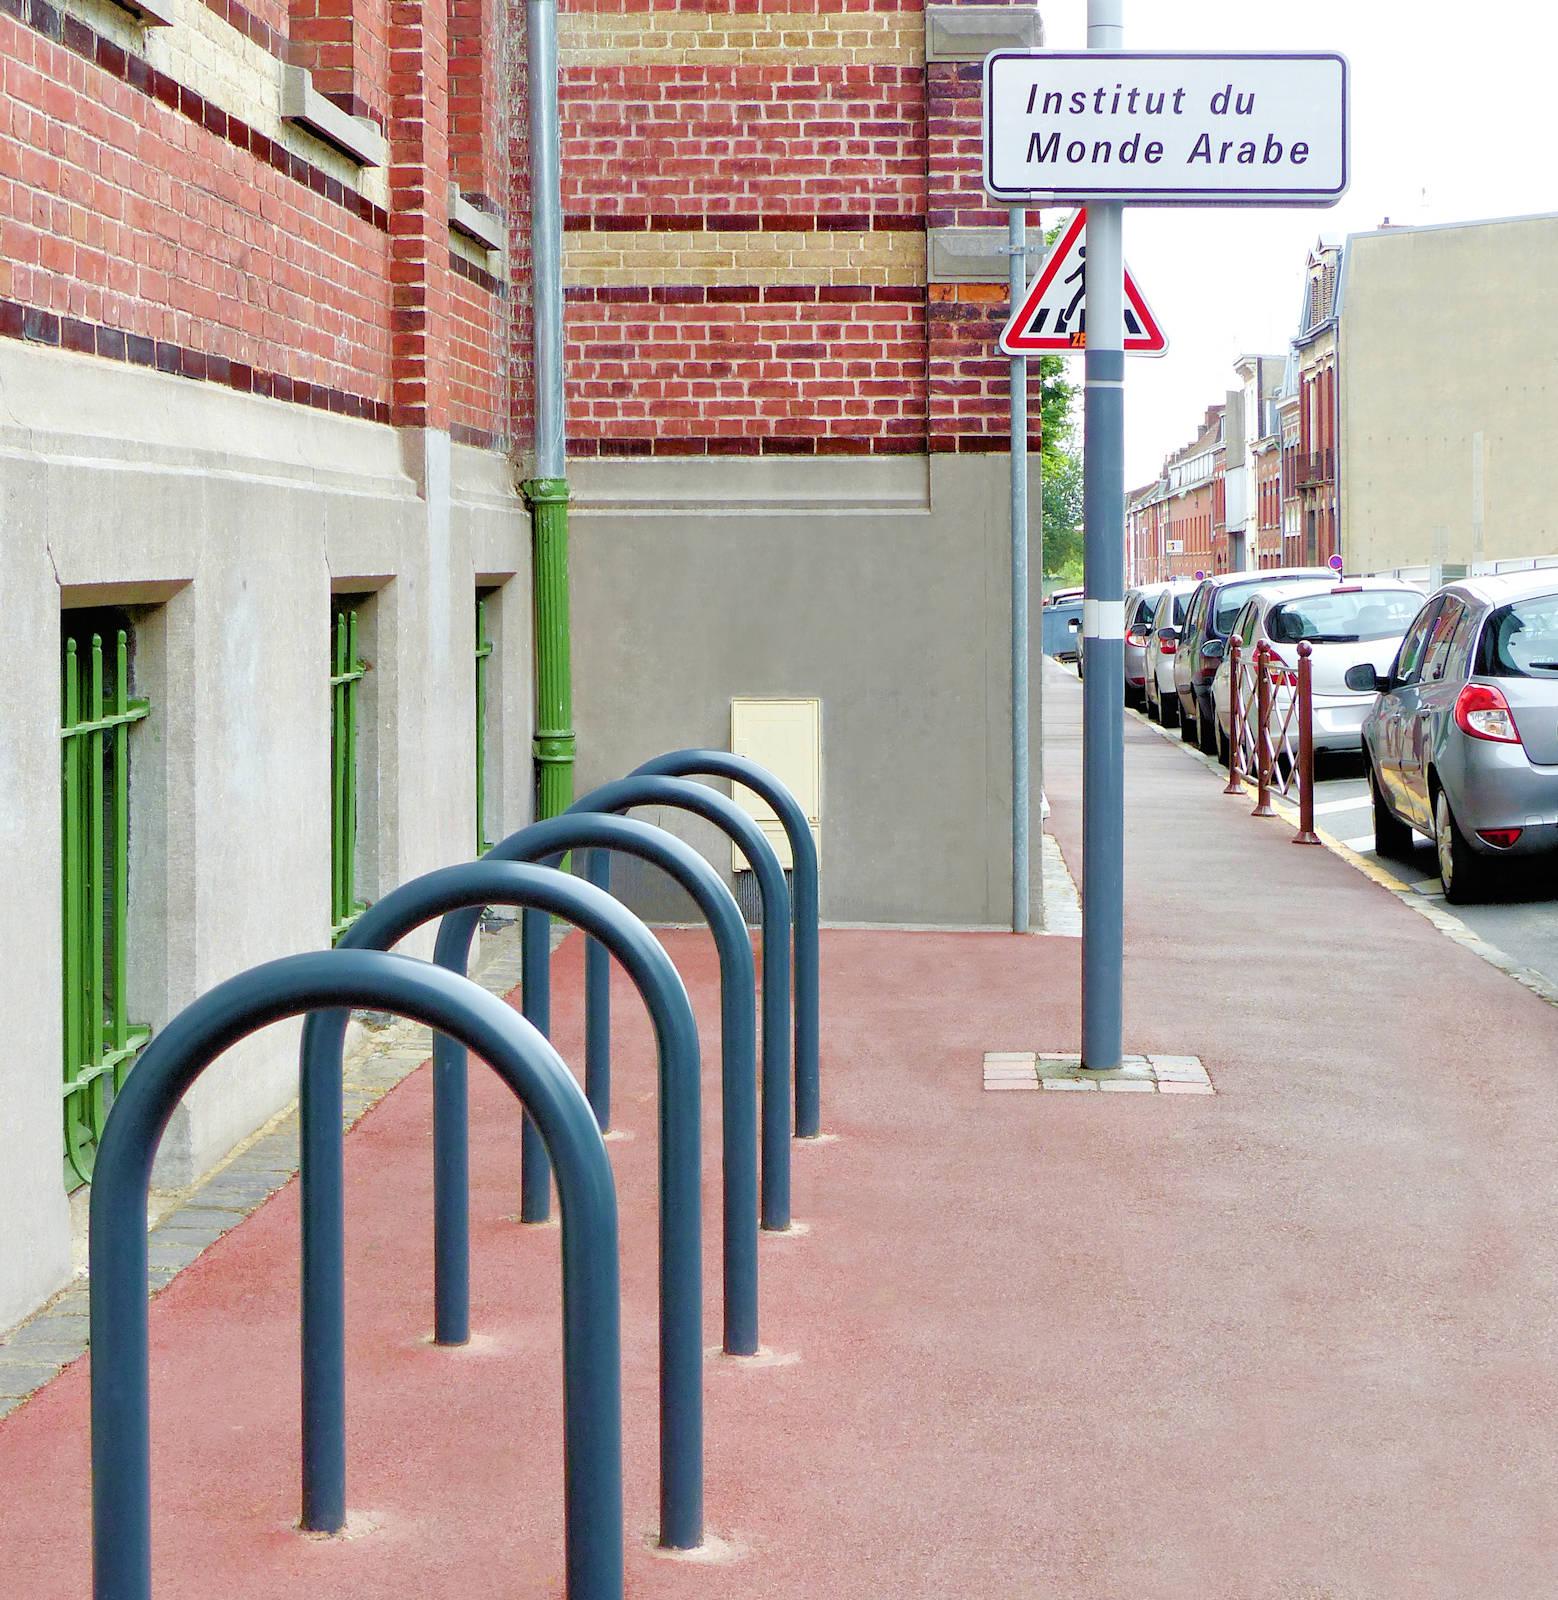 Institut du Monde Arabe, Tourcoing - Garage des deux roues.